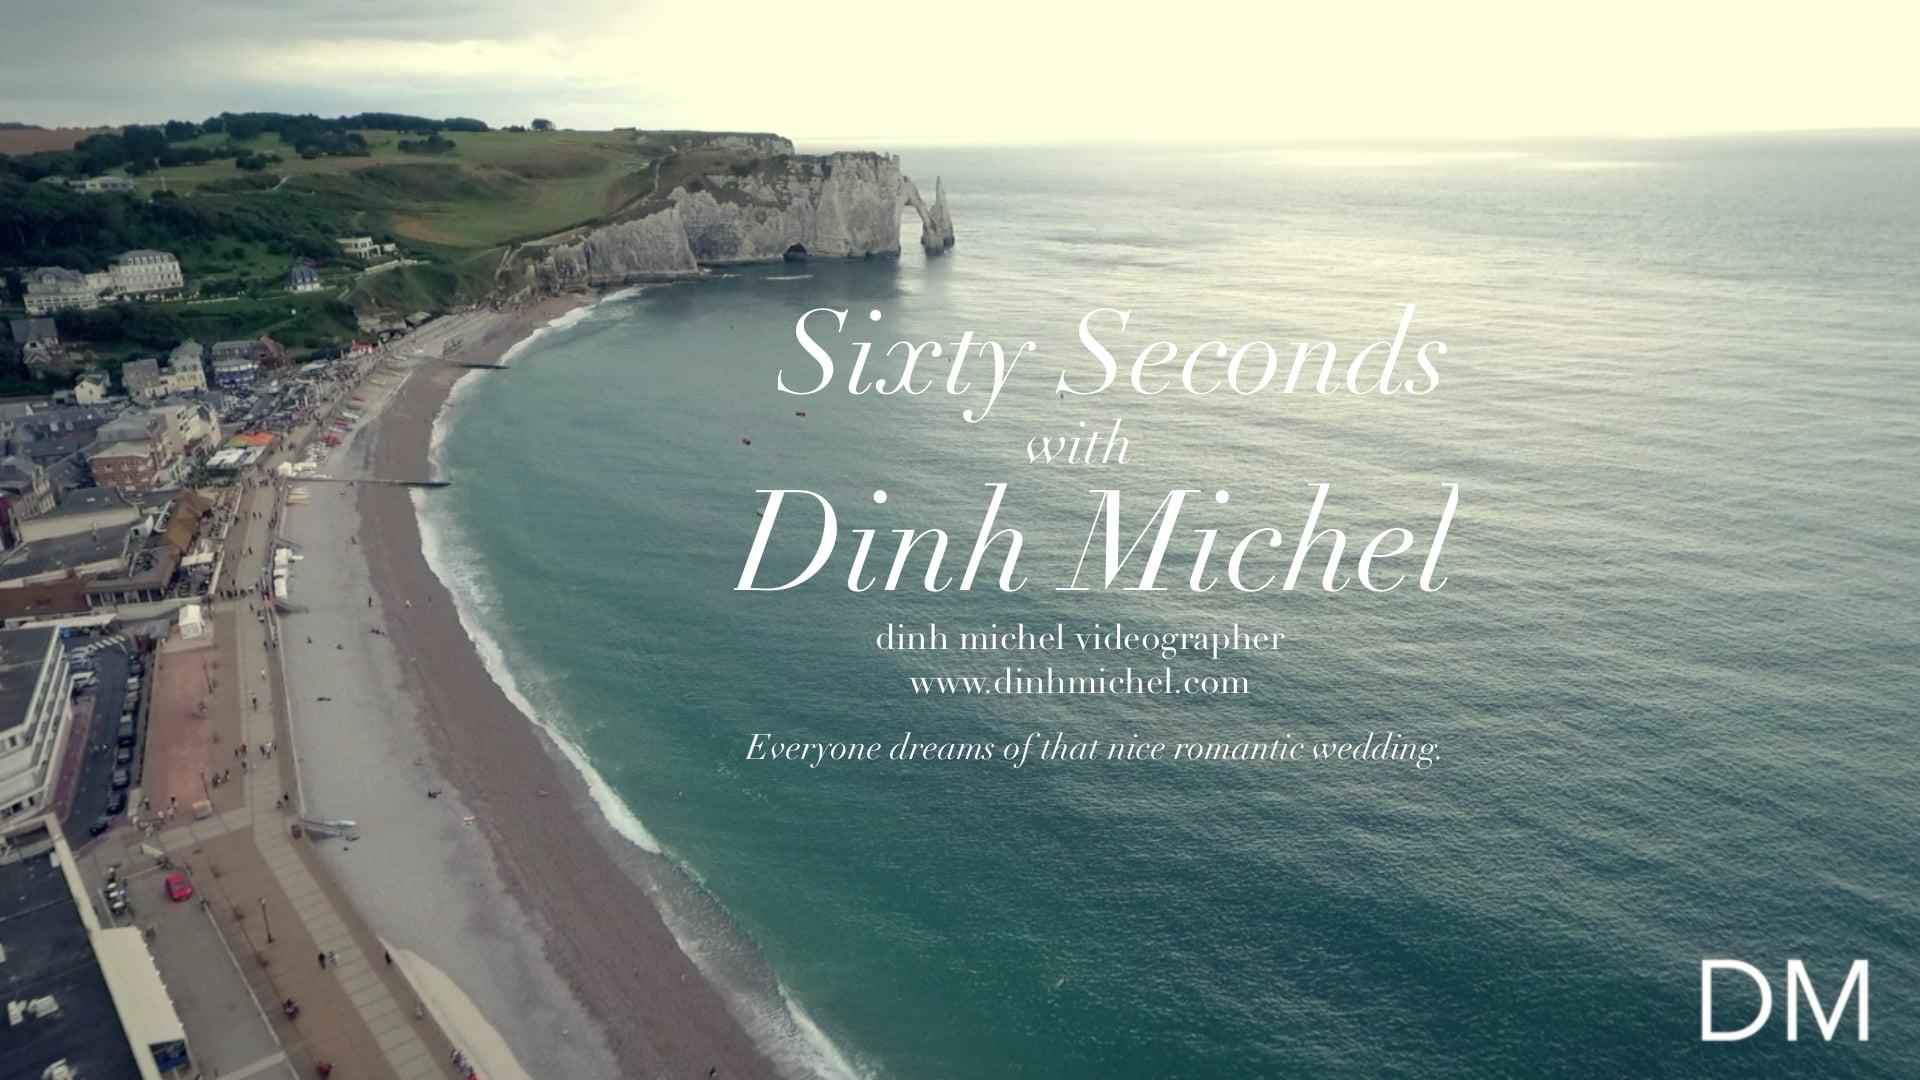 Dinh Michel